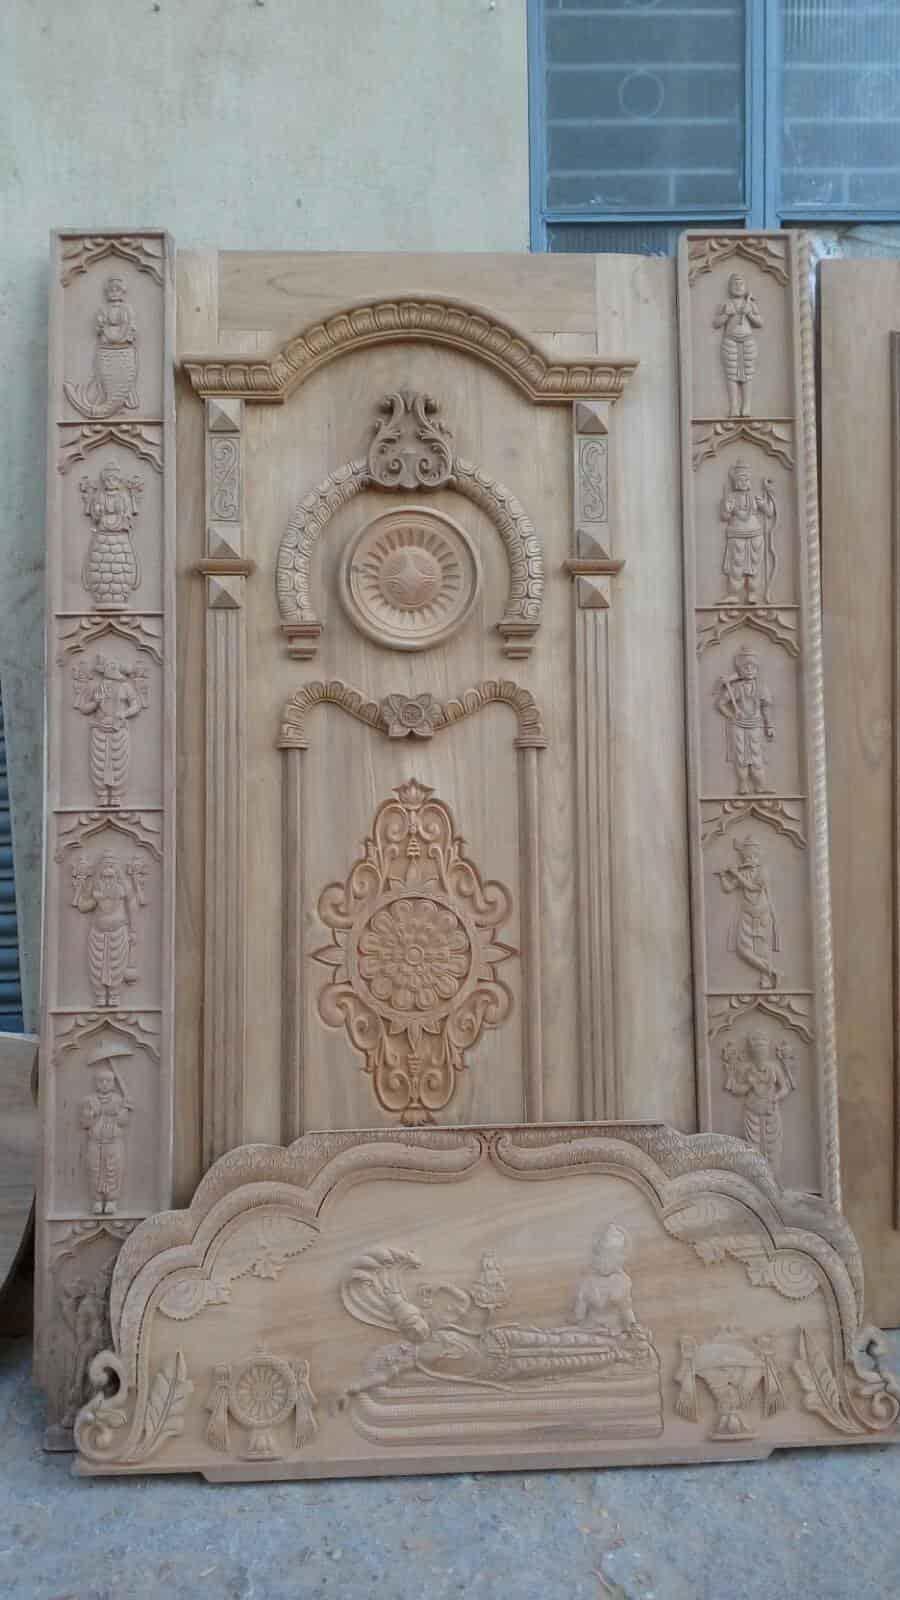 Msa wood carving and furniture works reviews tumkur ratings